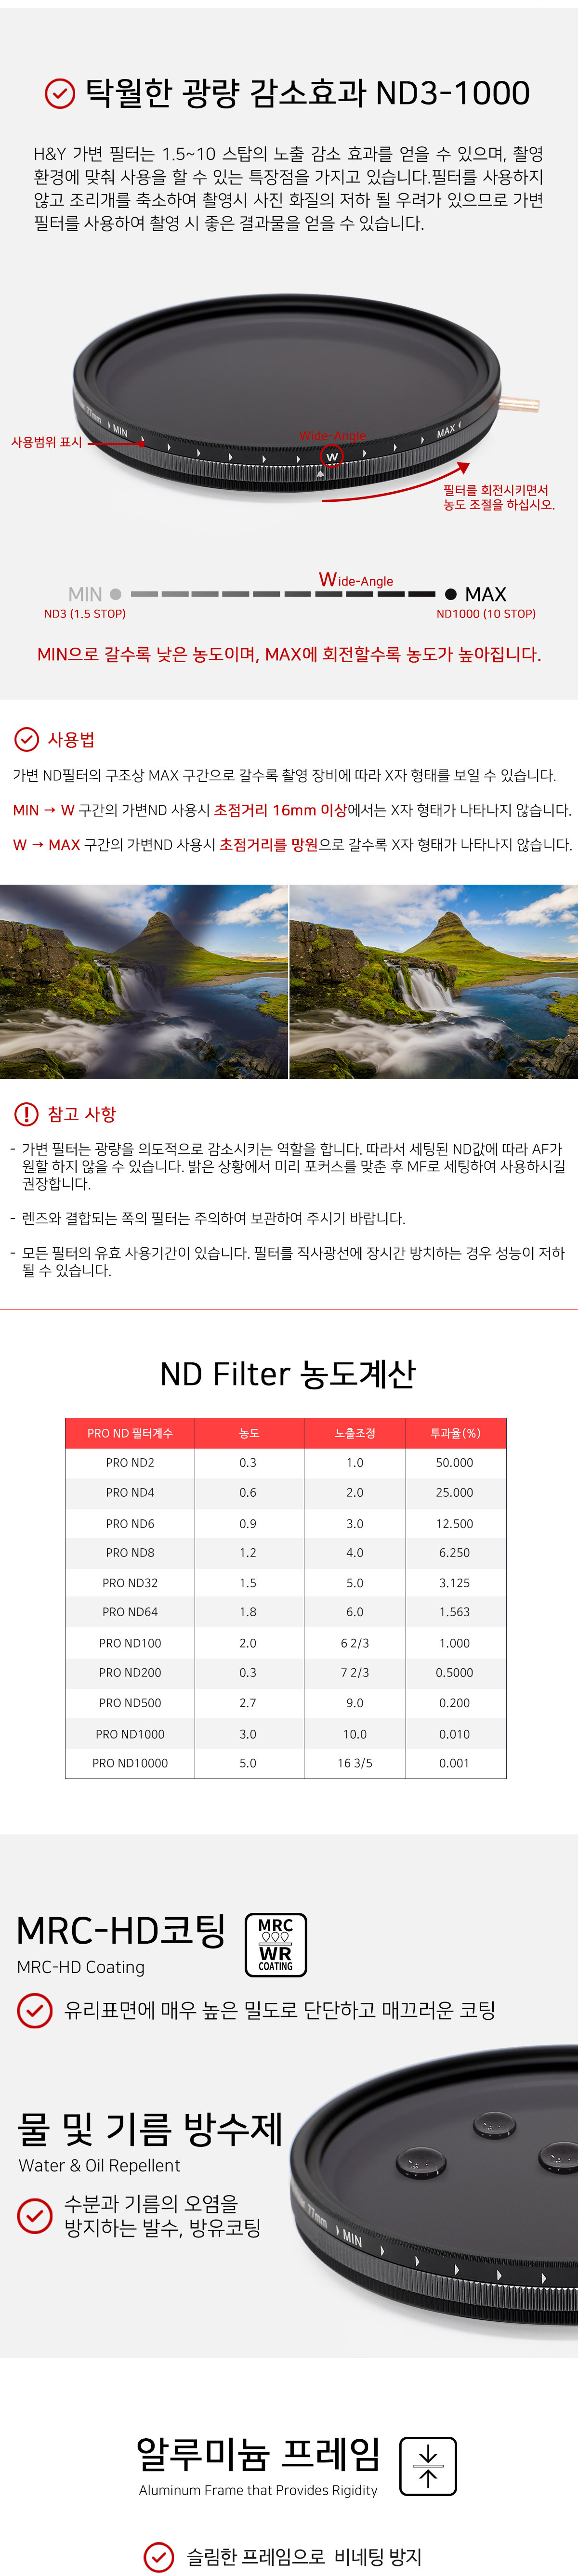 ND3_1000_CPL_2.jpg